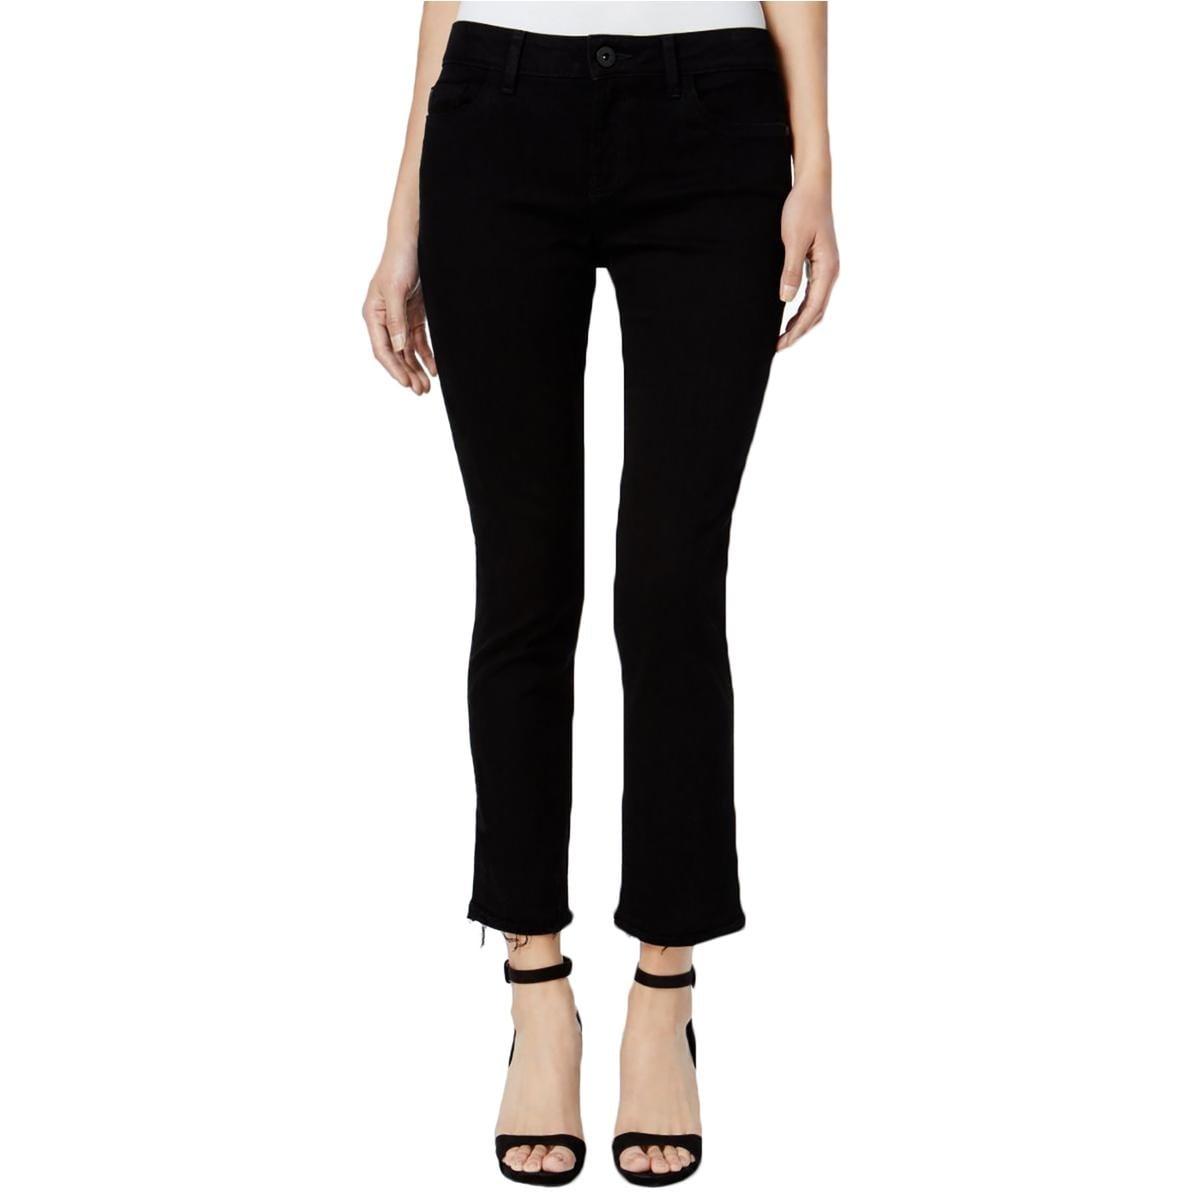 ee8ba76f51af8 Shop DL1961 Womens Mara Jeggings Frayed Hem Straight Ankle - Free Shipping  Today - Overstock - 18401978